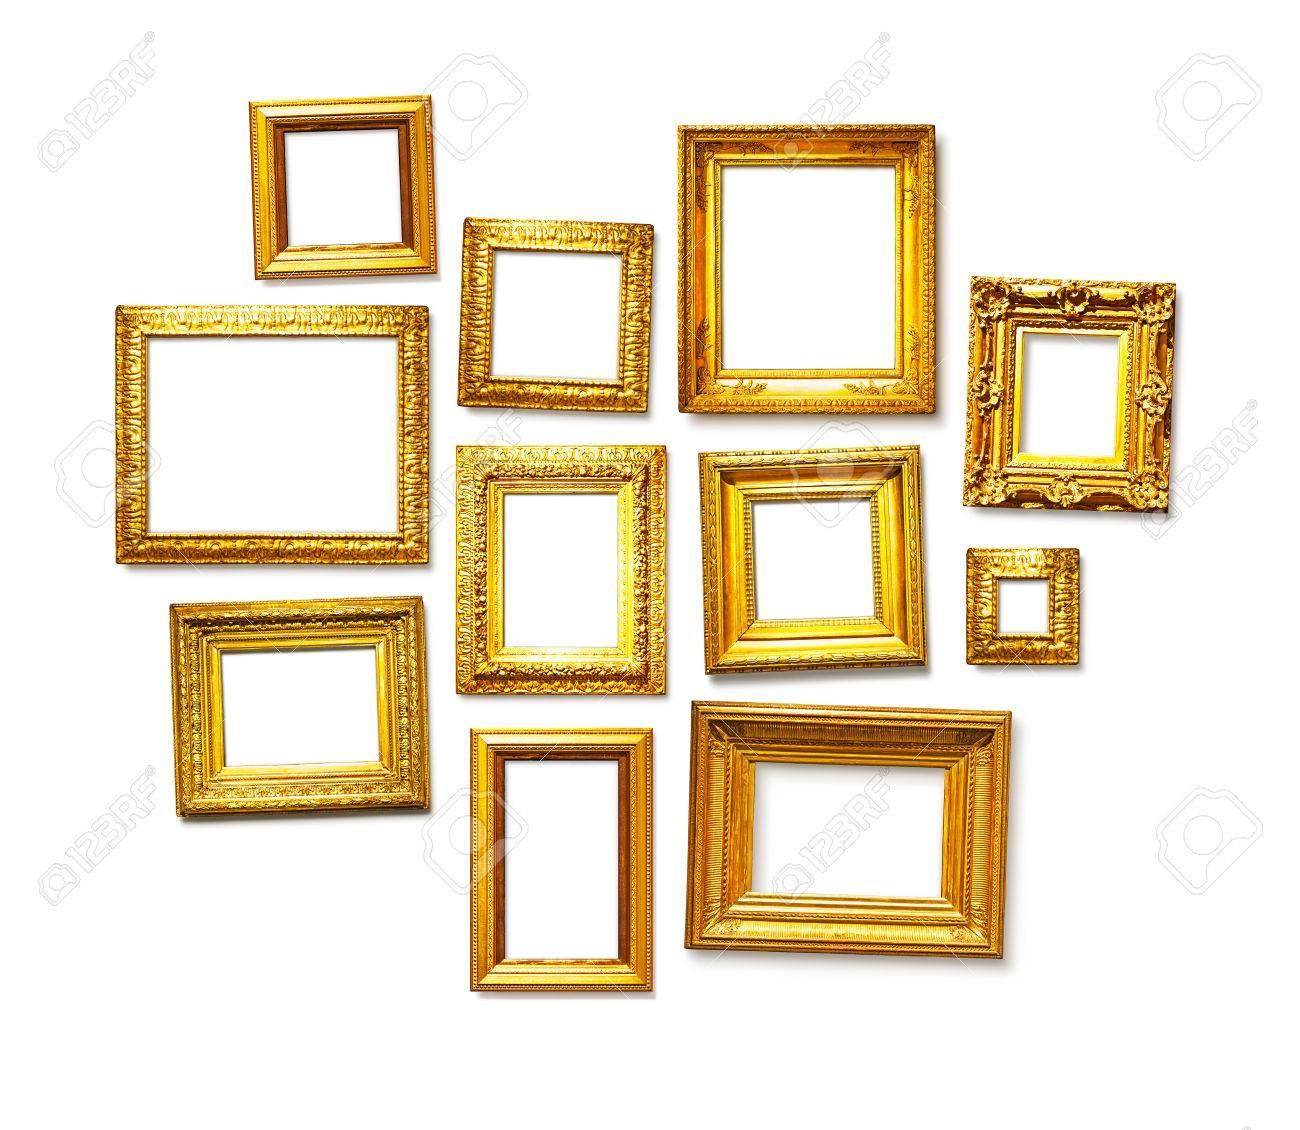 Set Of Antique Golden Frames On White Background. Art Gallery Stock ...